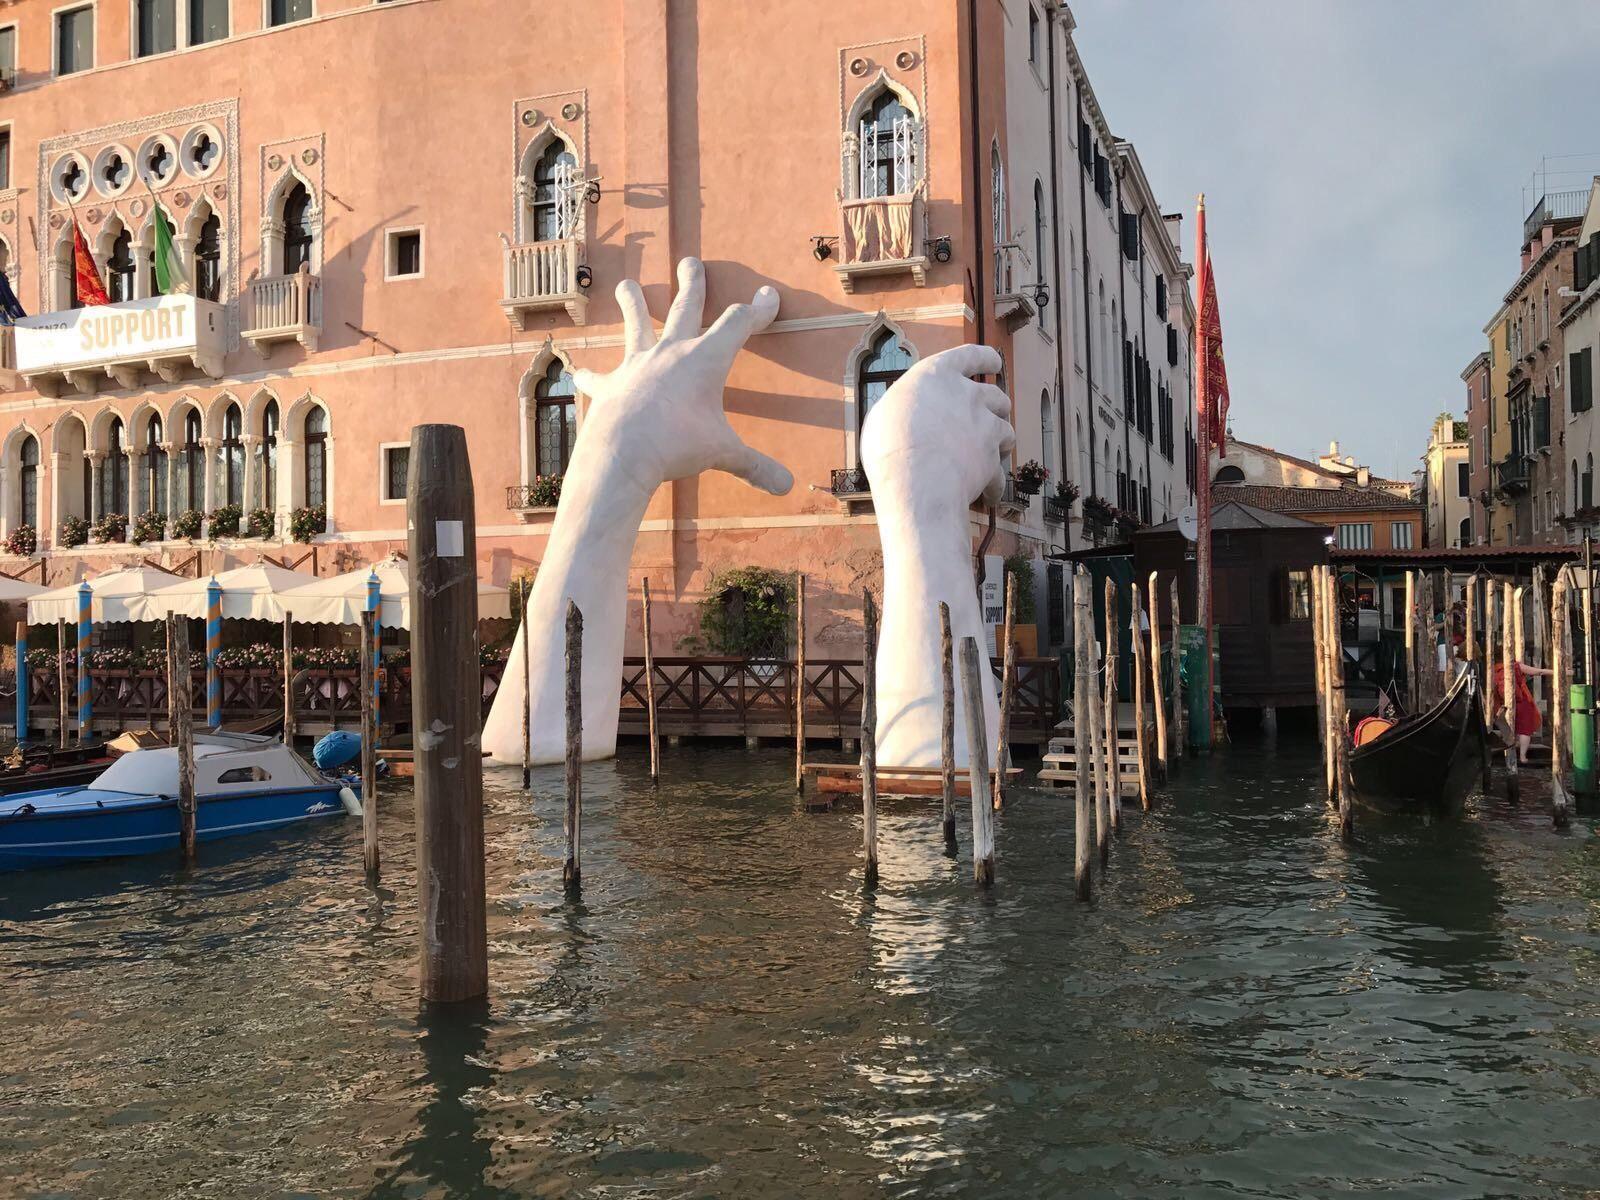 Памятник в канале Венеции, Италия